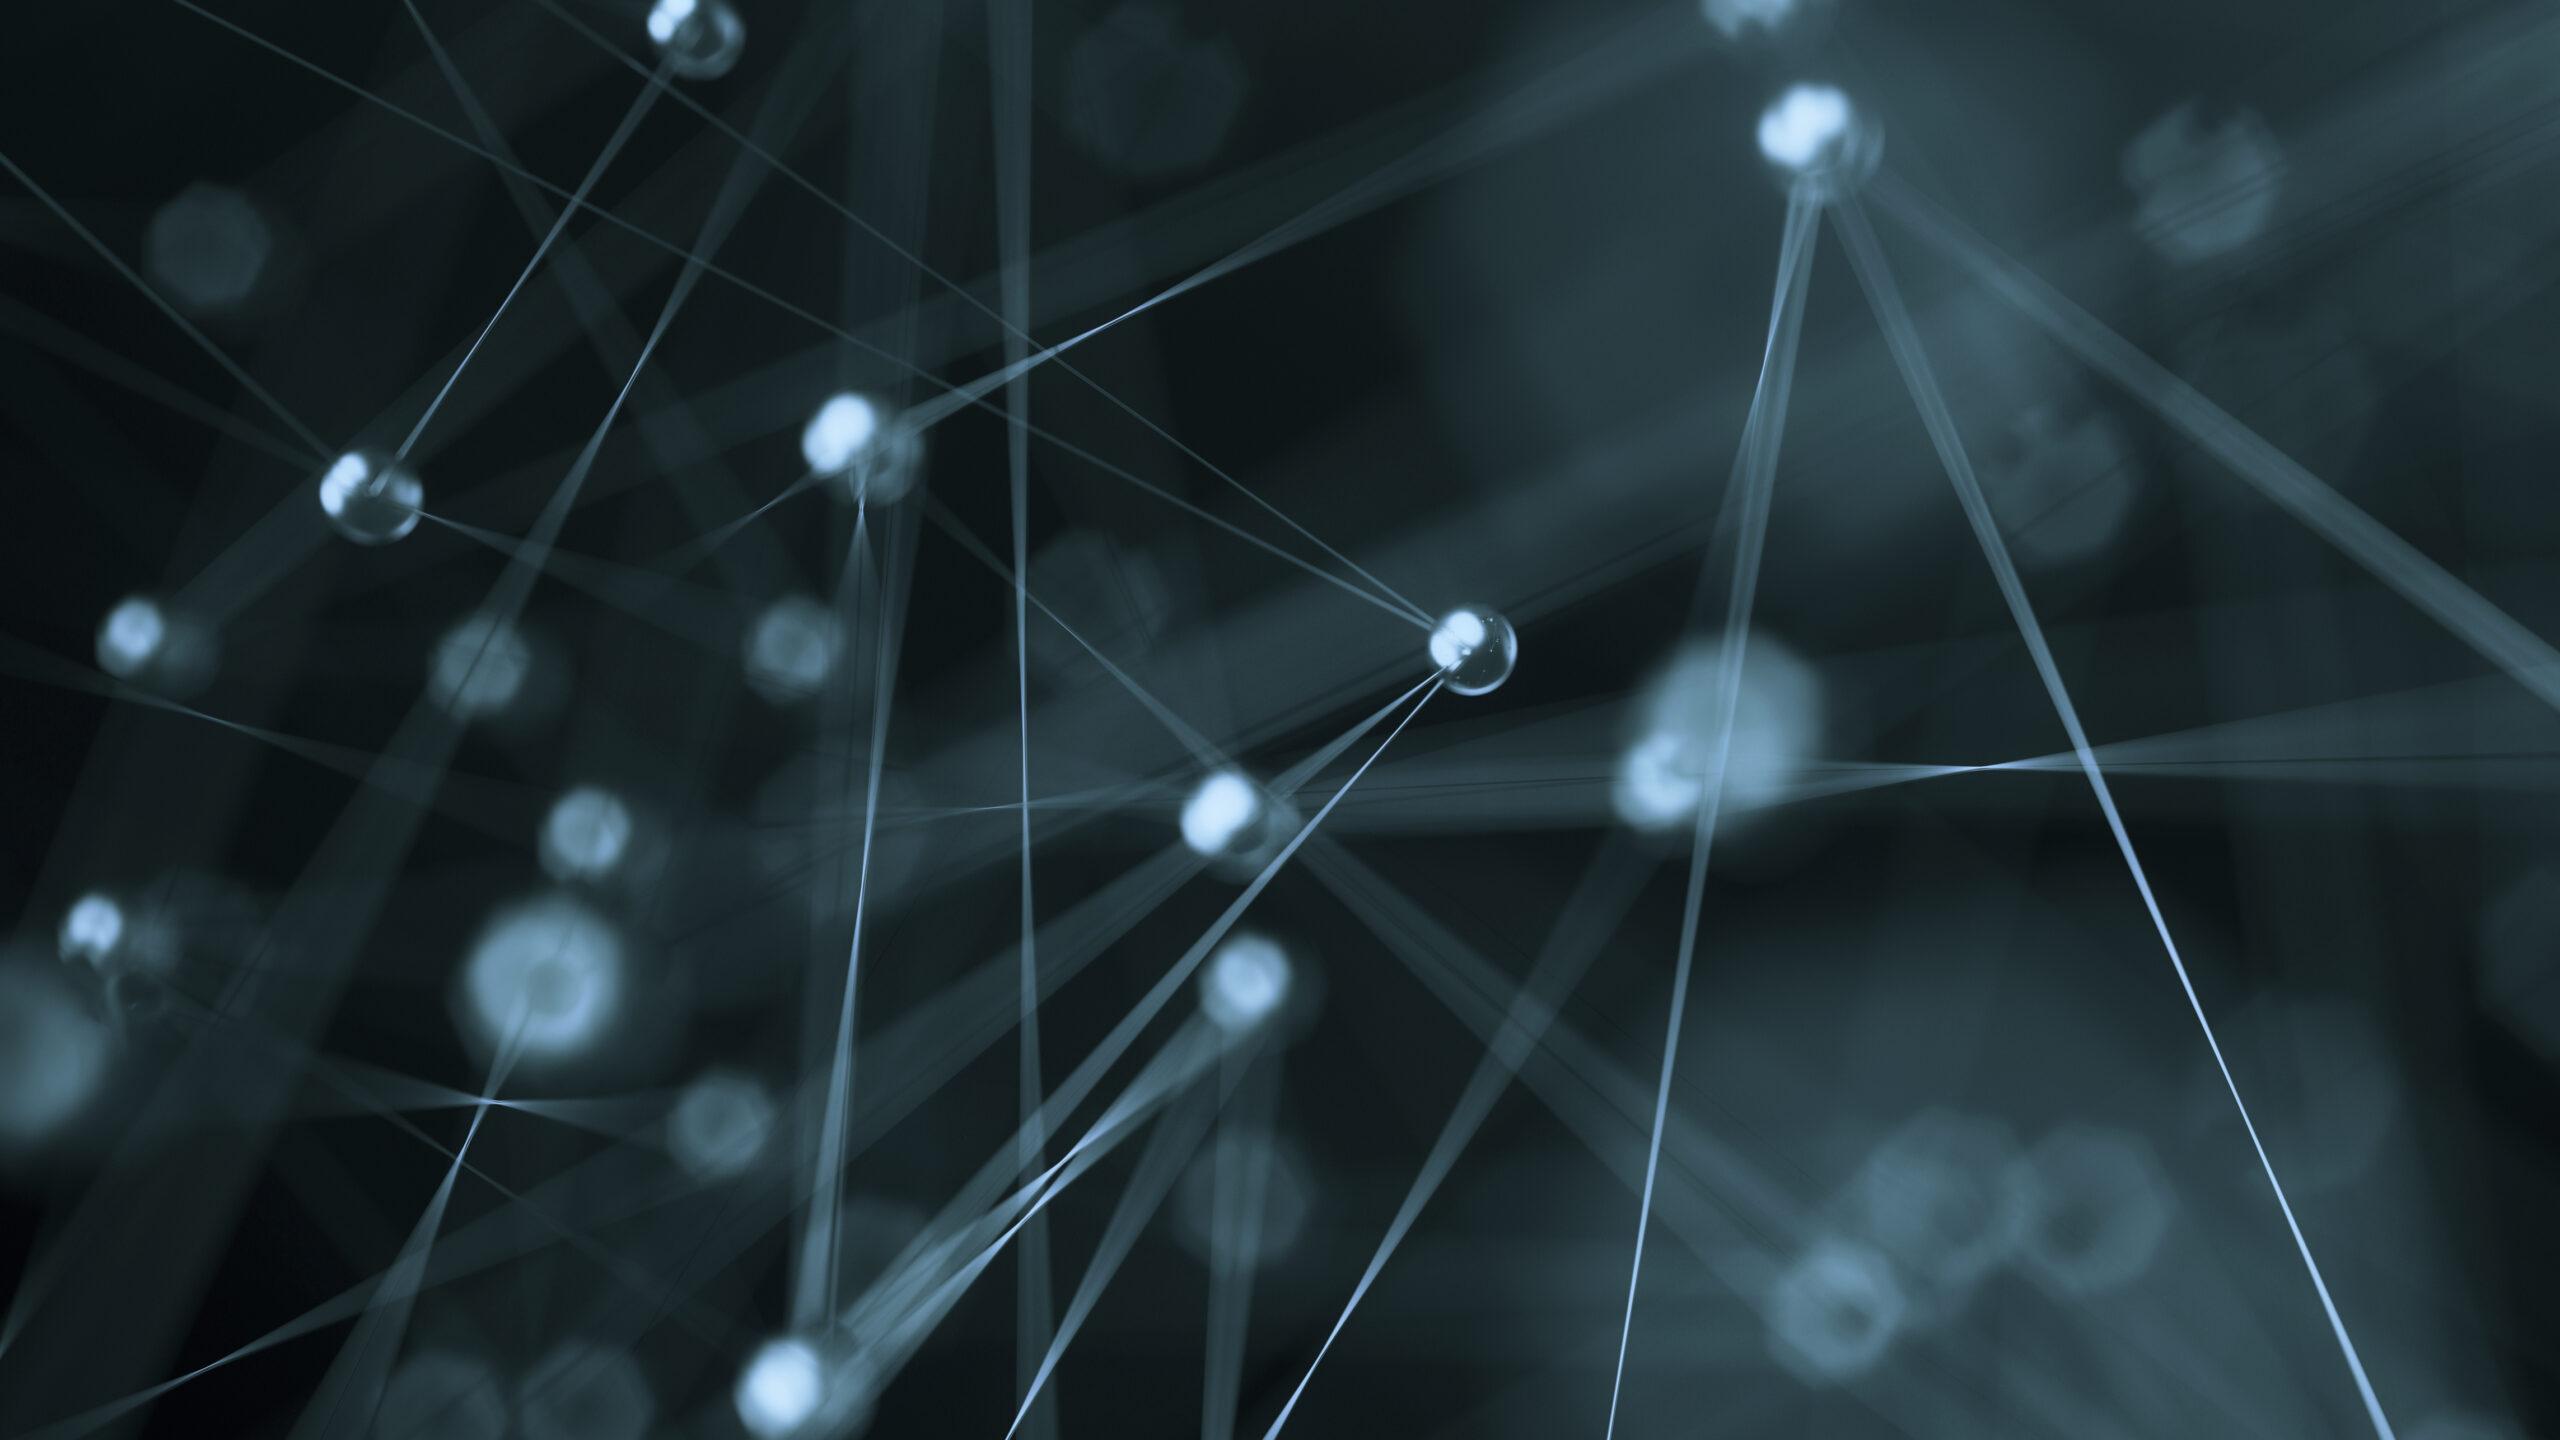 Experts in nanomaterials